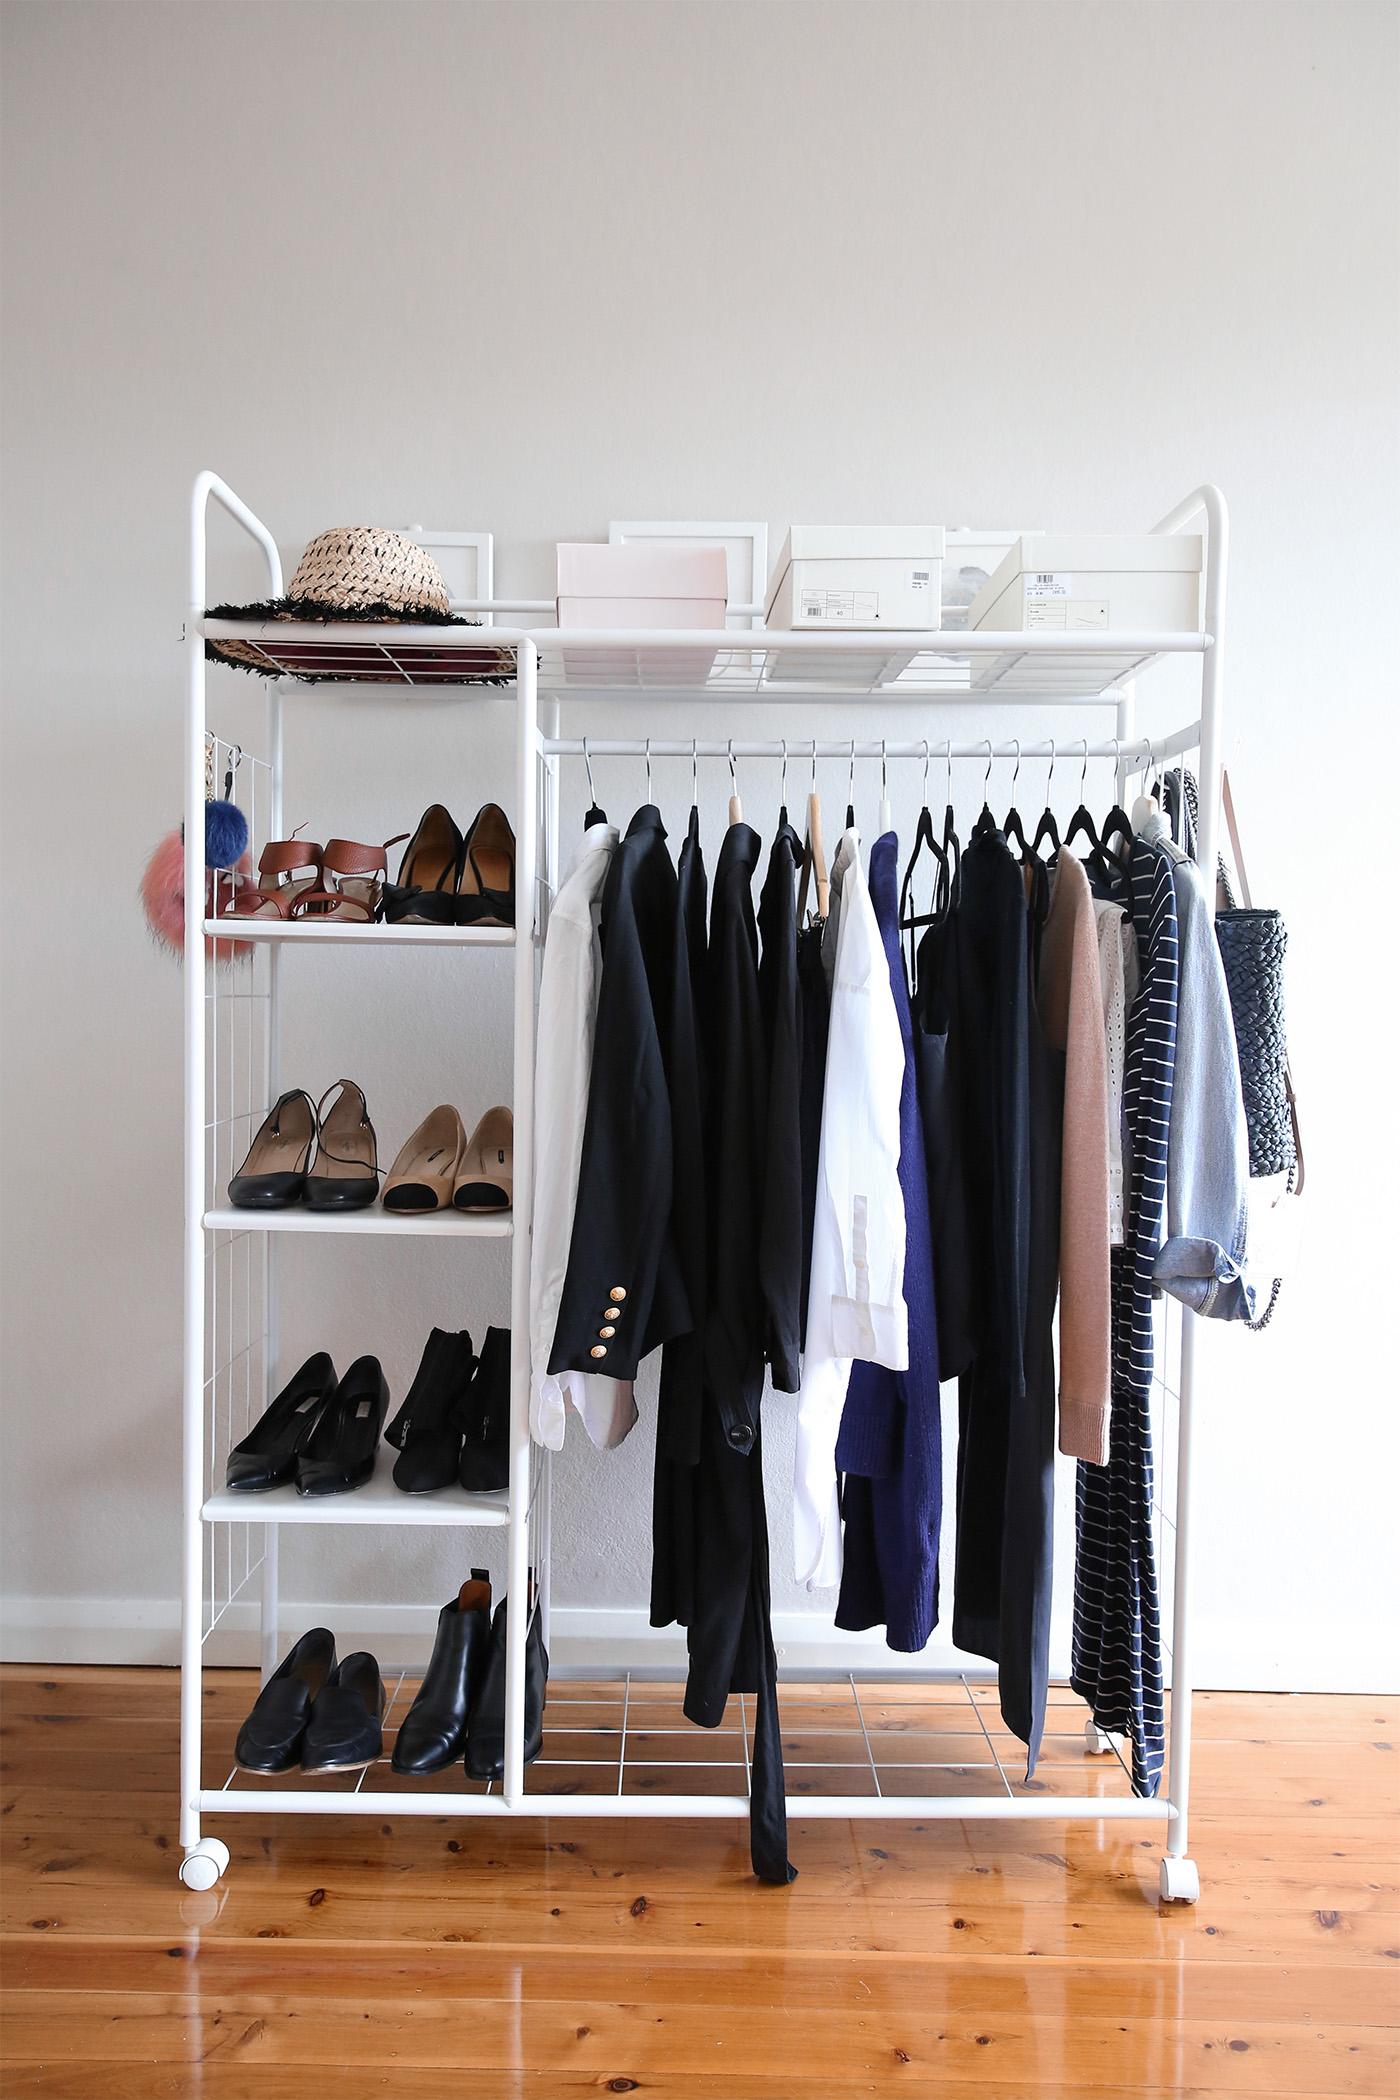 Mademoiselle | A Minimalist Fashion Blog